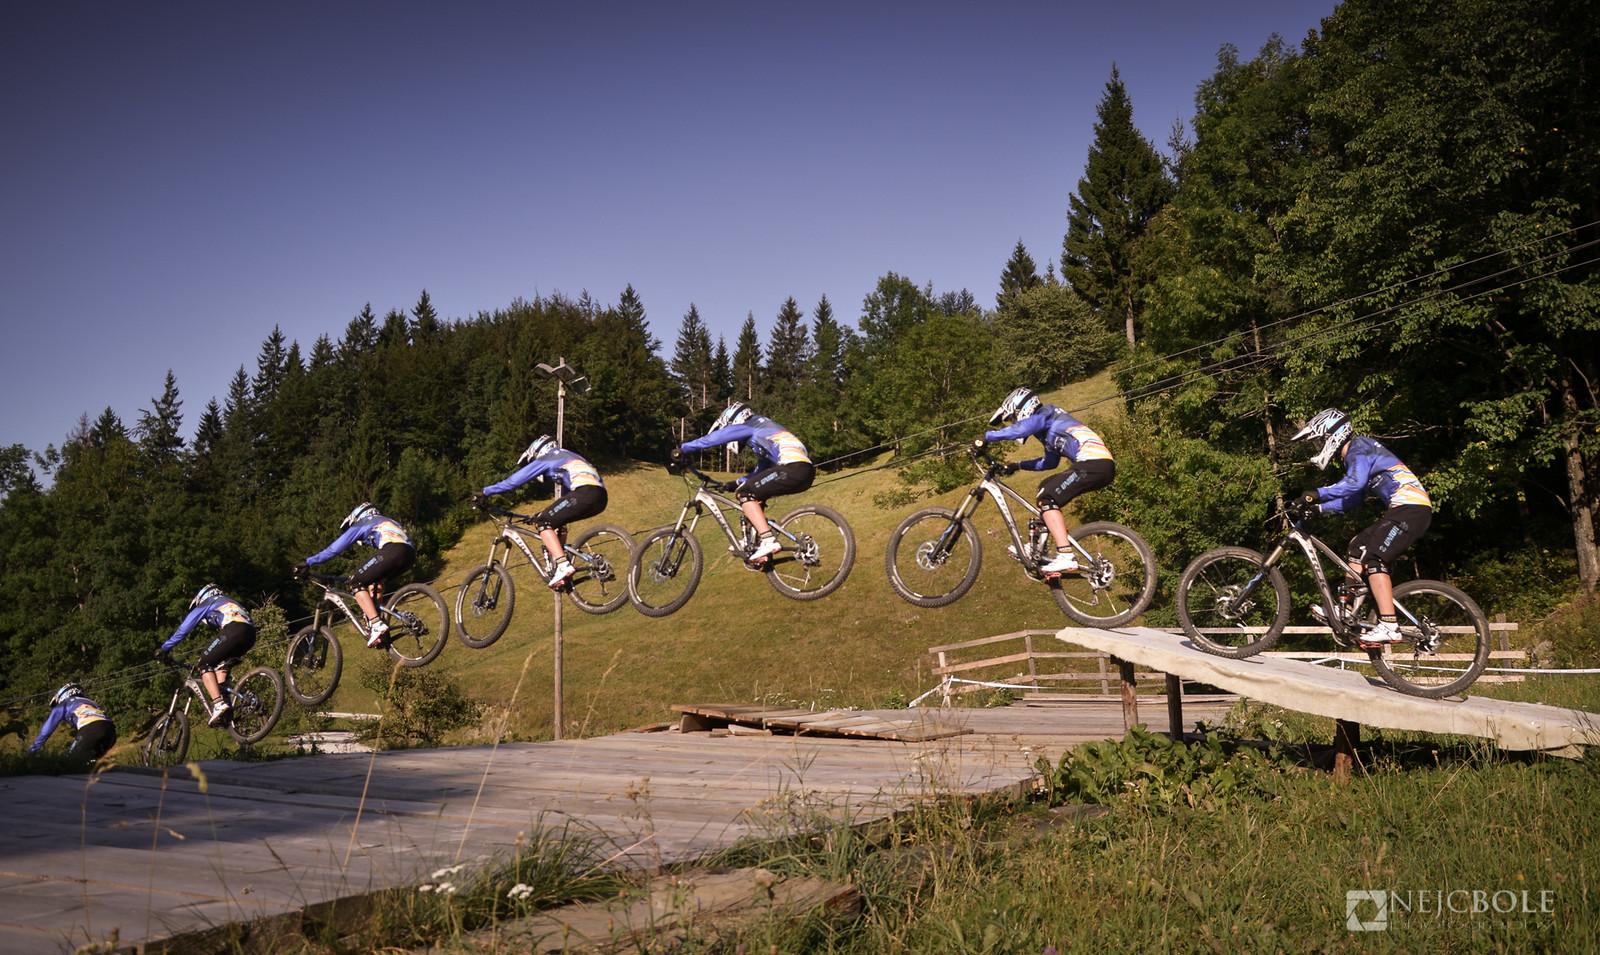 Tanja Zakelj training for WC XCO - kamplc - Mountain Biking Pictures - Vital MTB